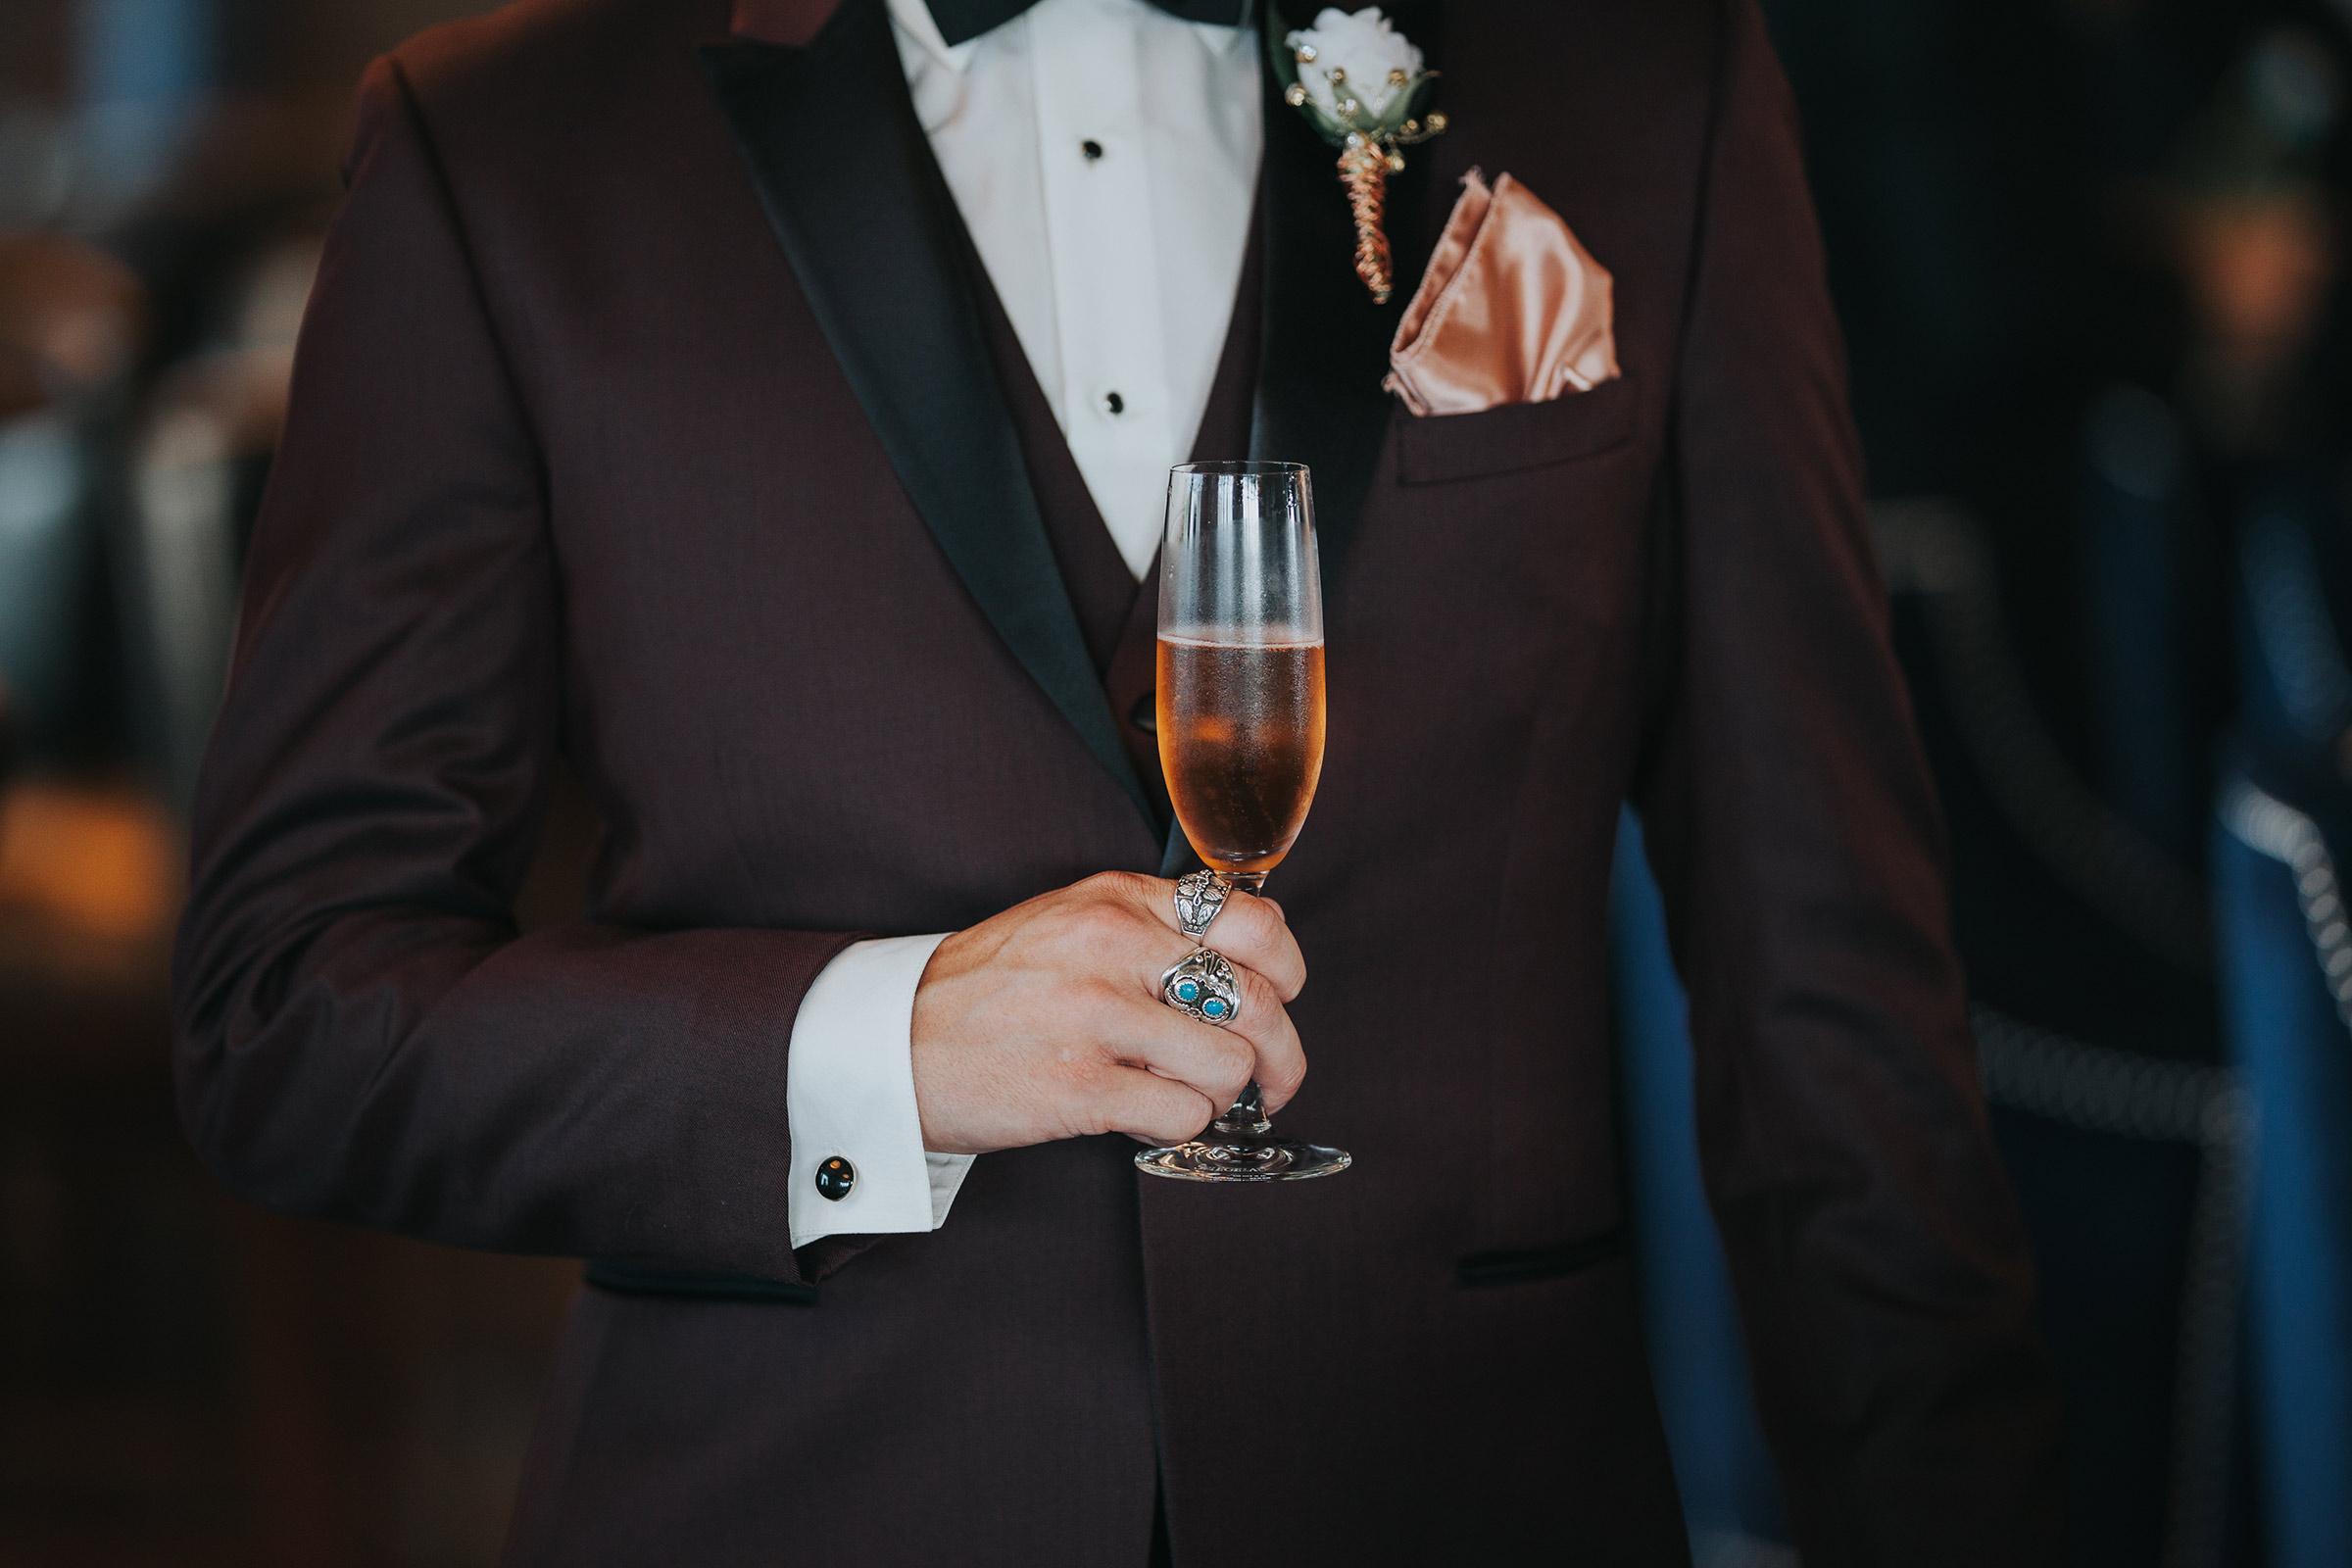 groom-holding-drink-republic-on-grand-desmoines-iowa-ac-hotel-raelyn-ramey-photography.jpg